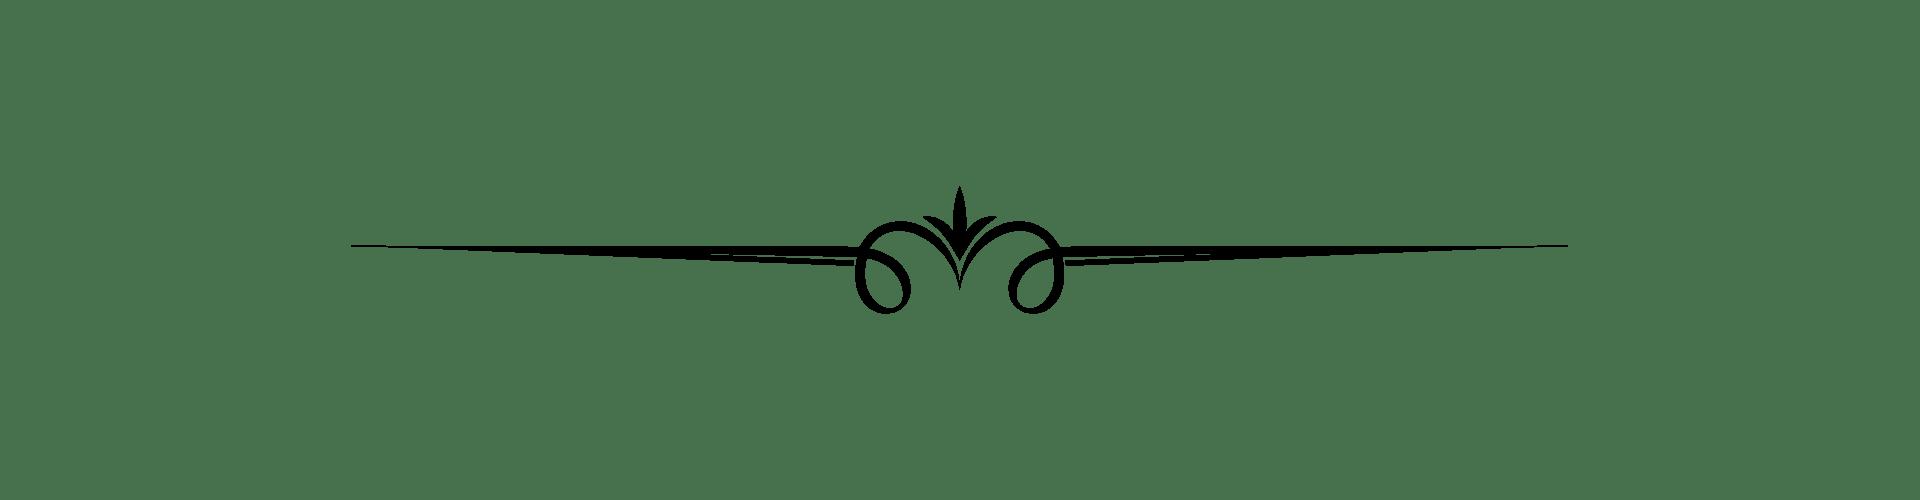 logo séparation